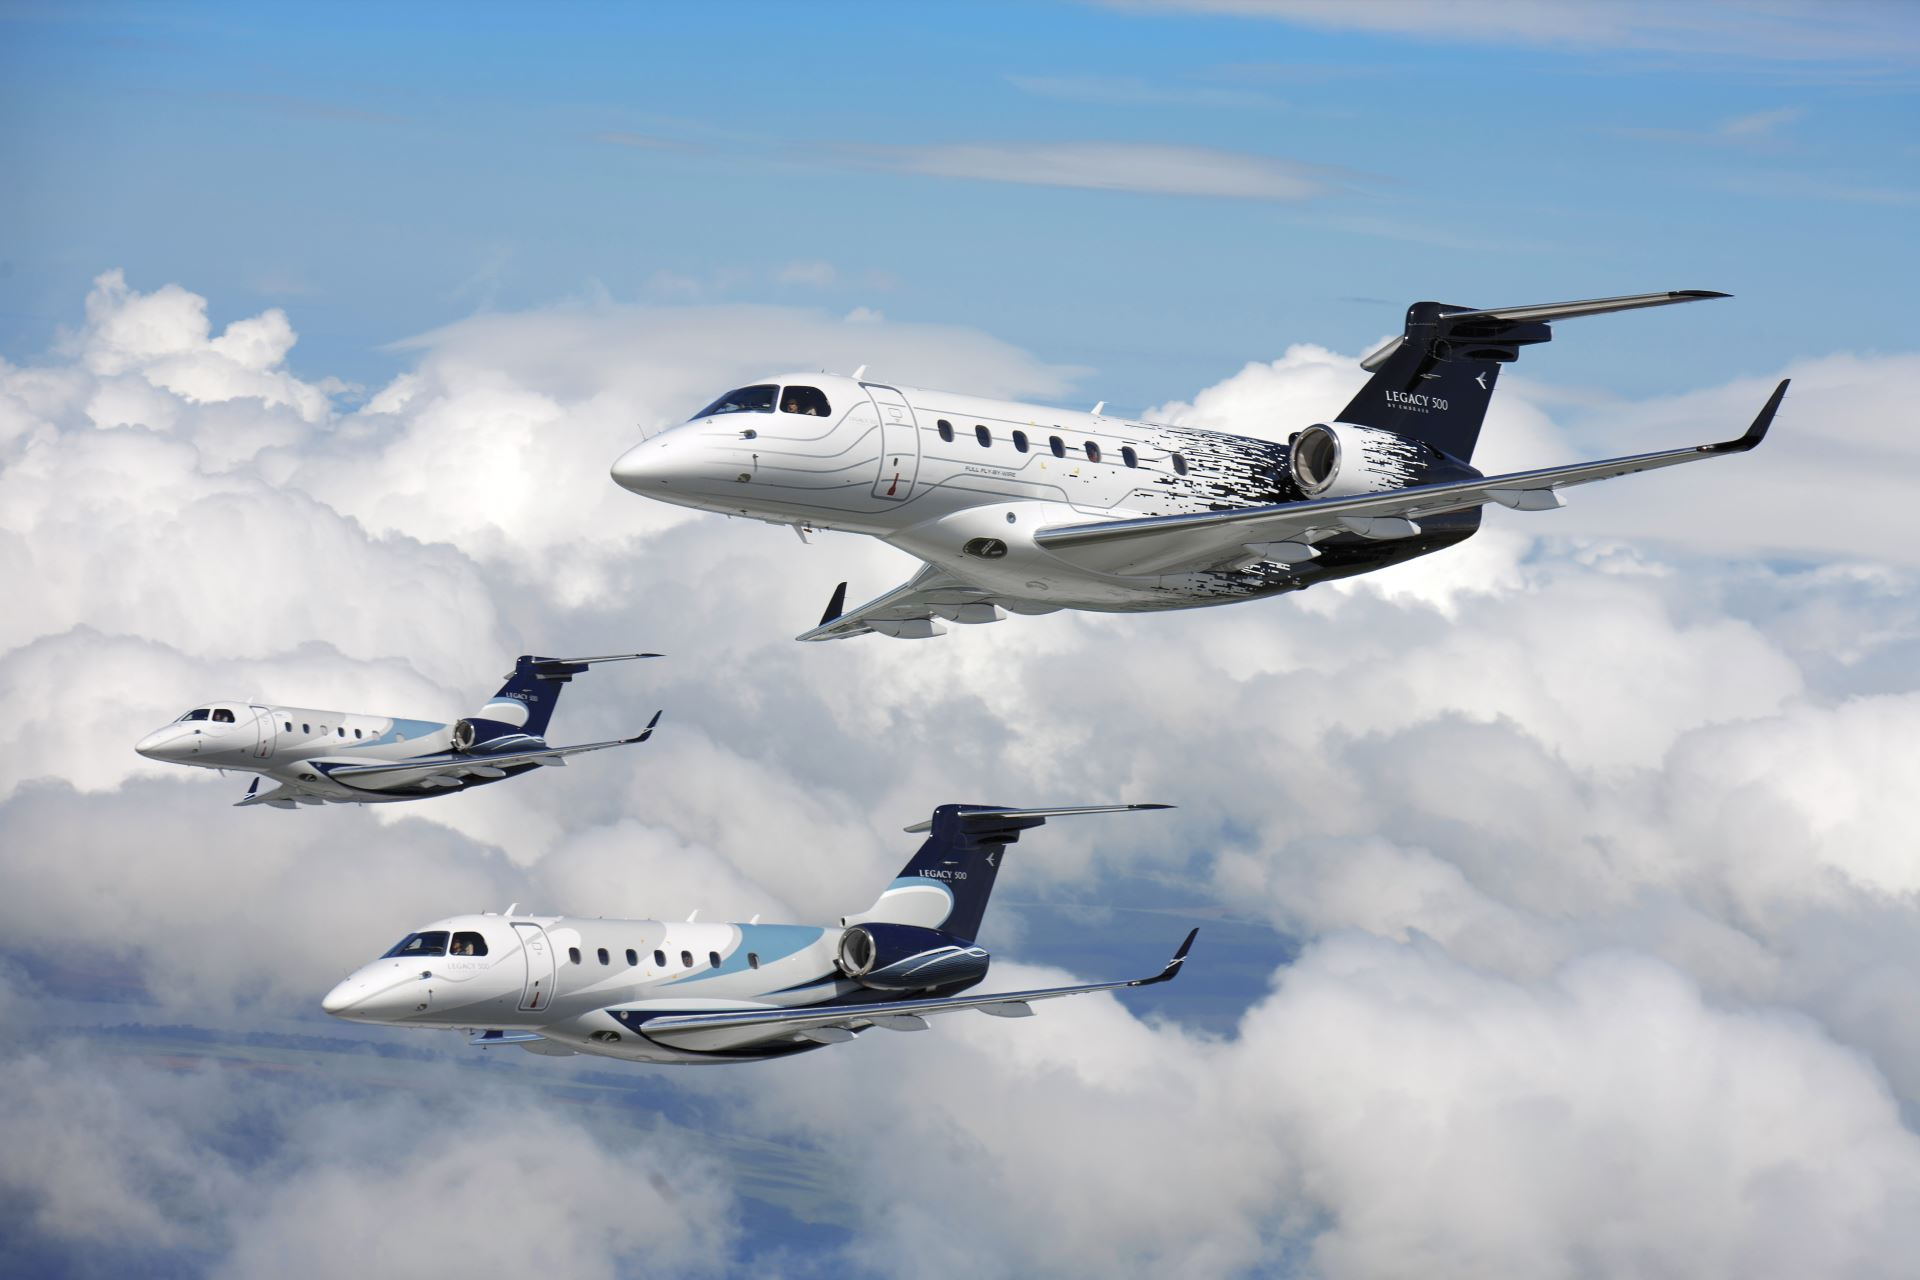 Legacy 500 jets